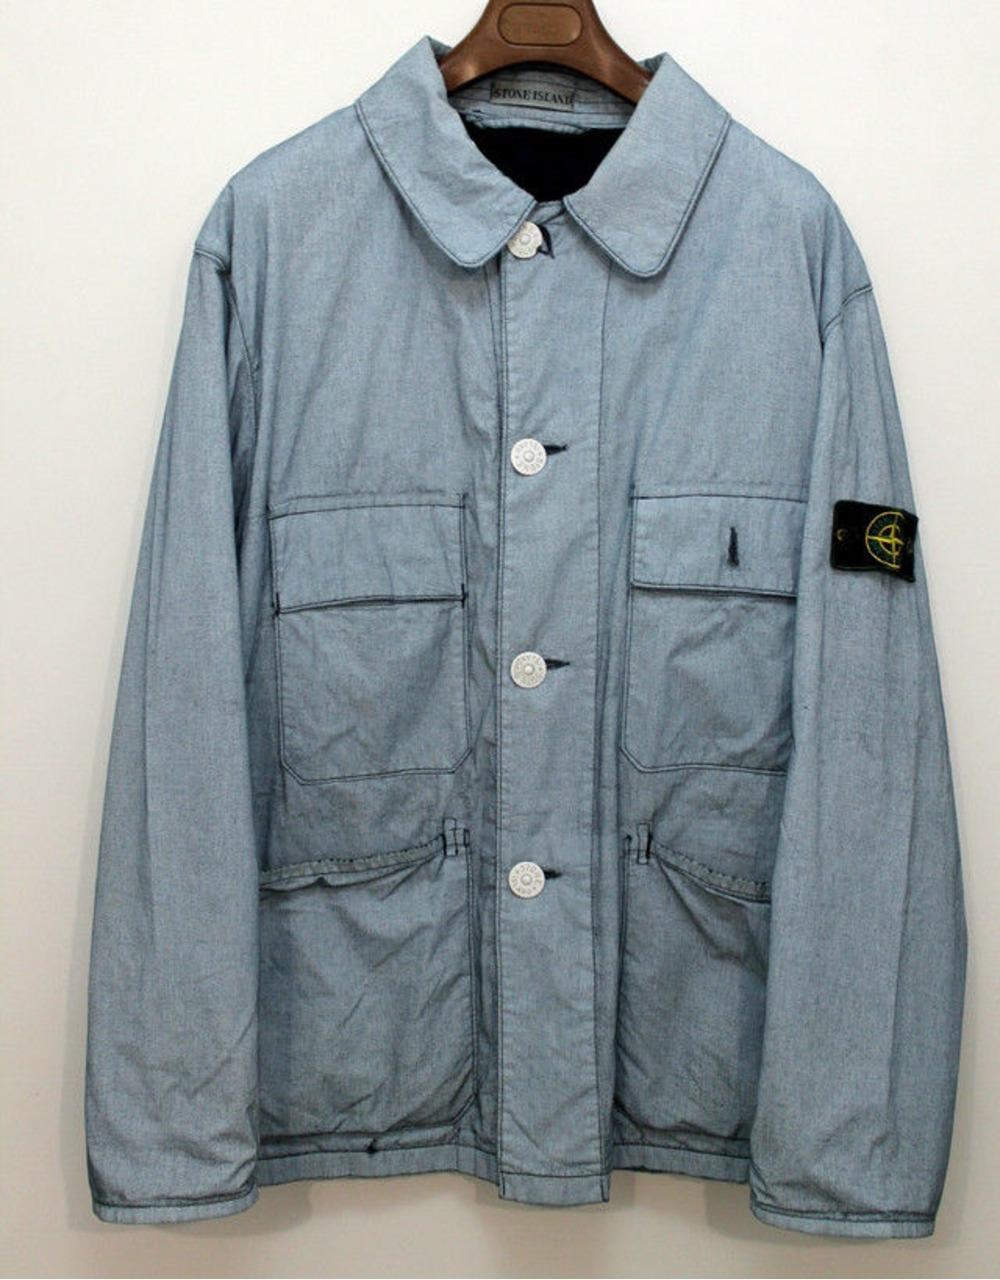 2298933-klekt-rare-stone-island-jacket-ice-vintage-marina-massimo-osti-archive-size-xl-normal.jpg